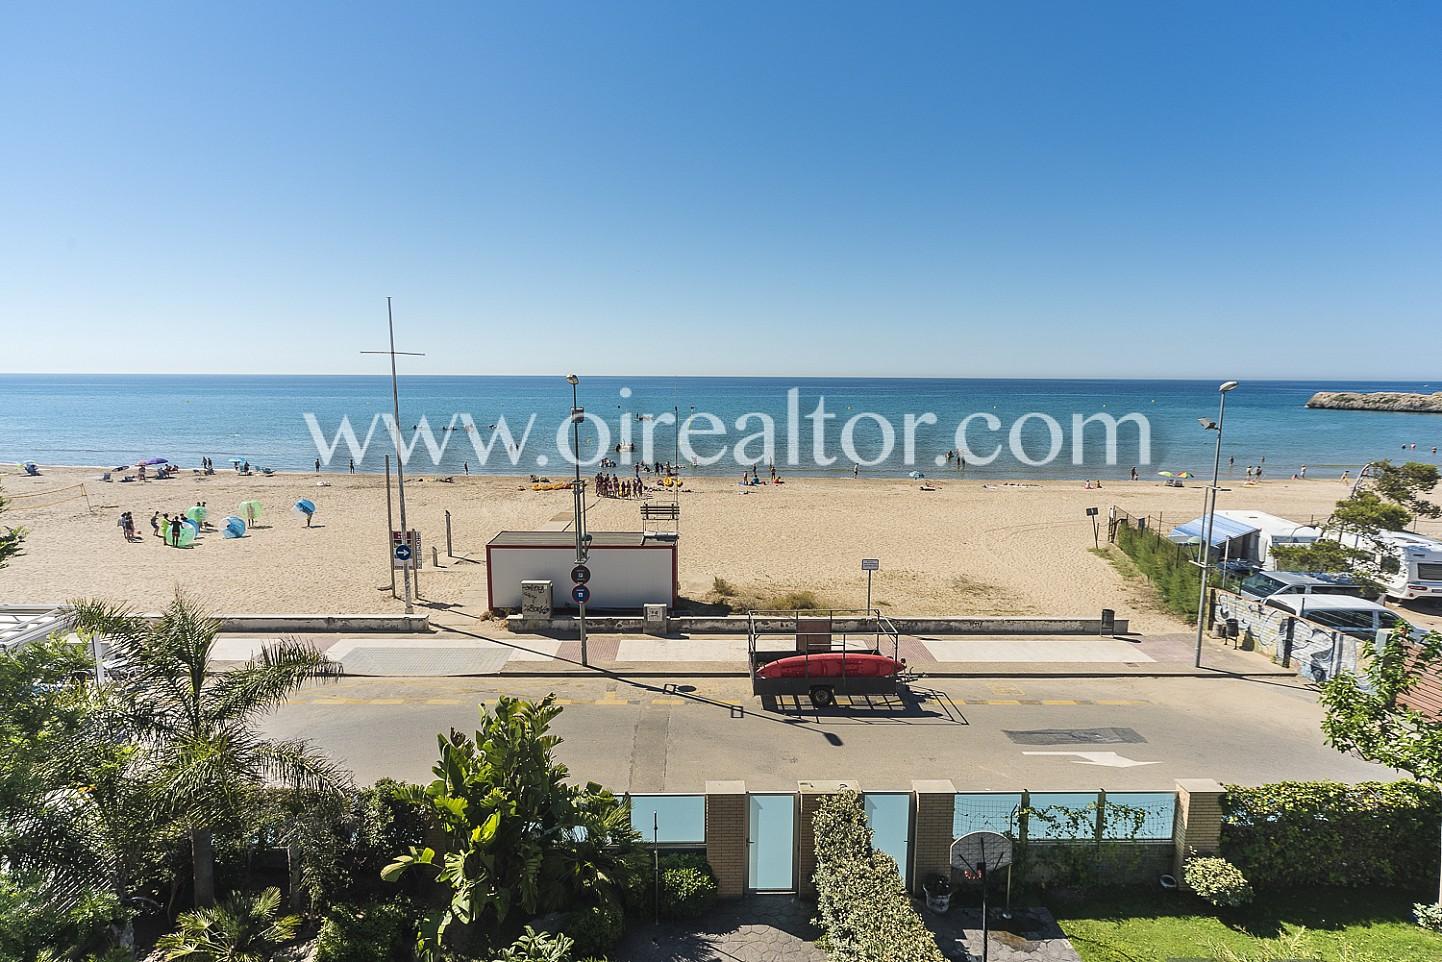 Espectacular casa a un paso de la playa en tarragona oi for Apartamentos jardin playa larga tarragona